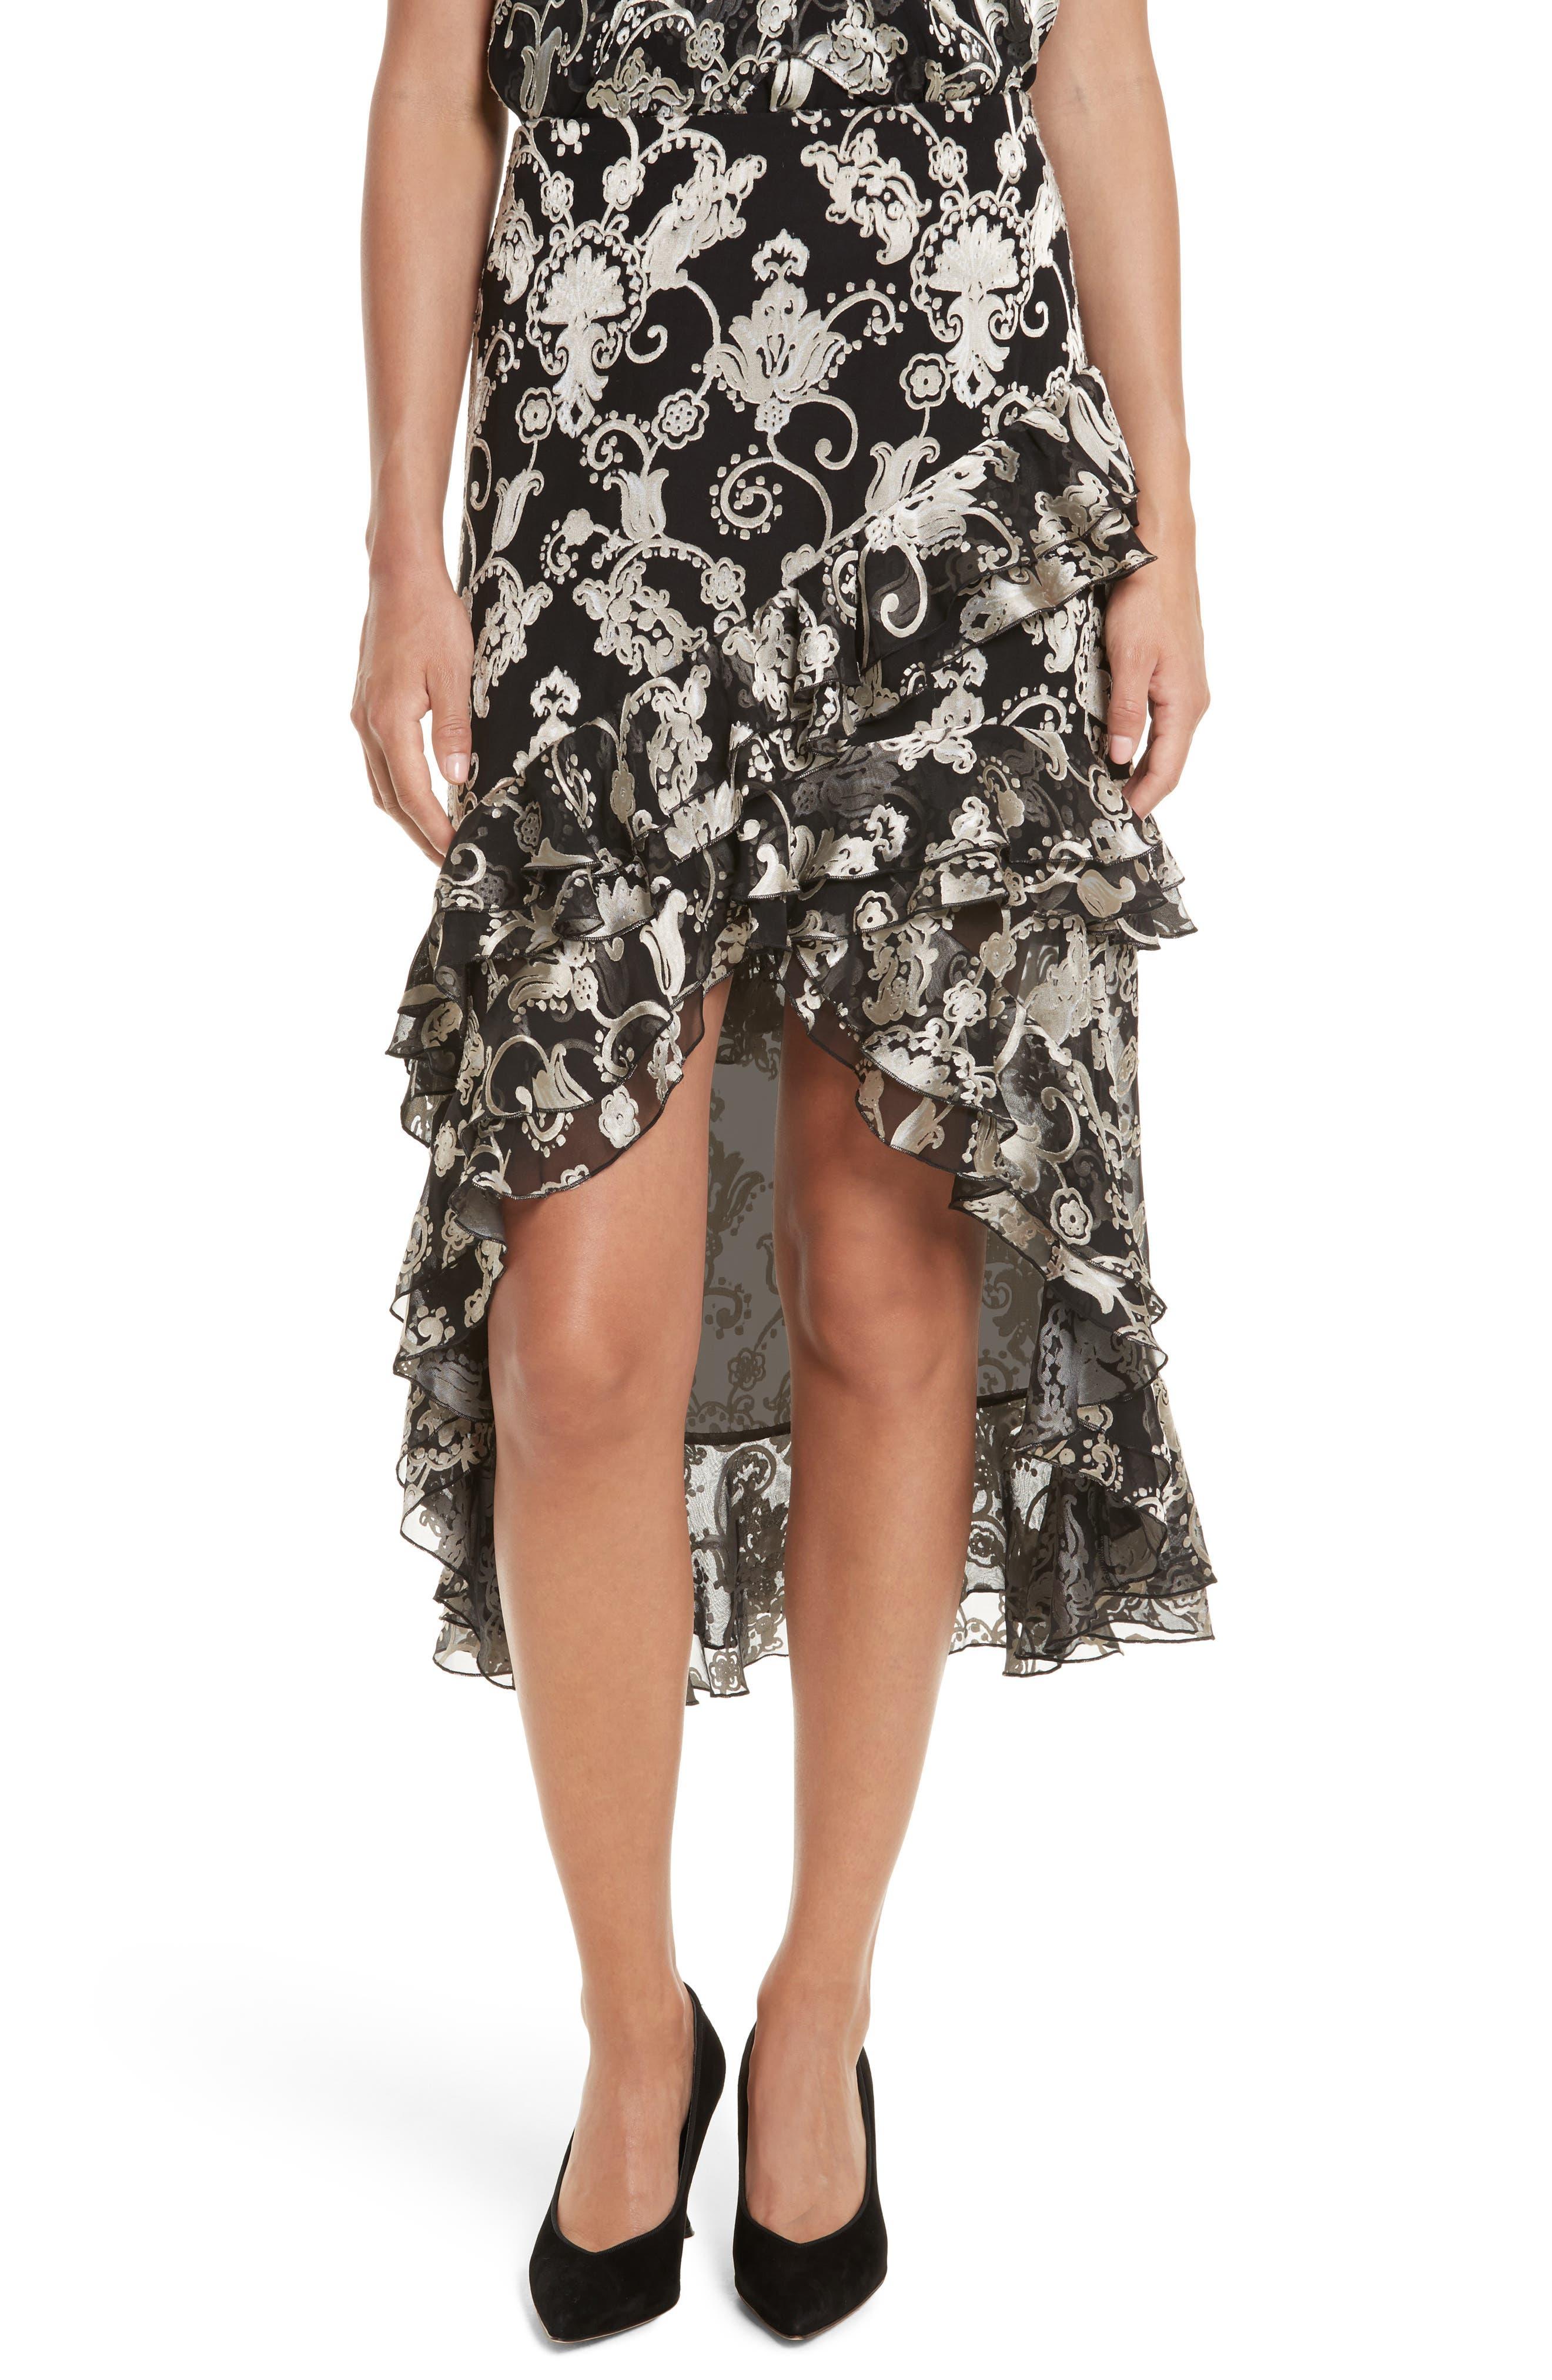 Sasha Asymmetrical Tiered Ruffle Skirt,                             Main thumbnail 1, color,                             Black/ White